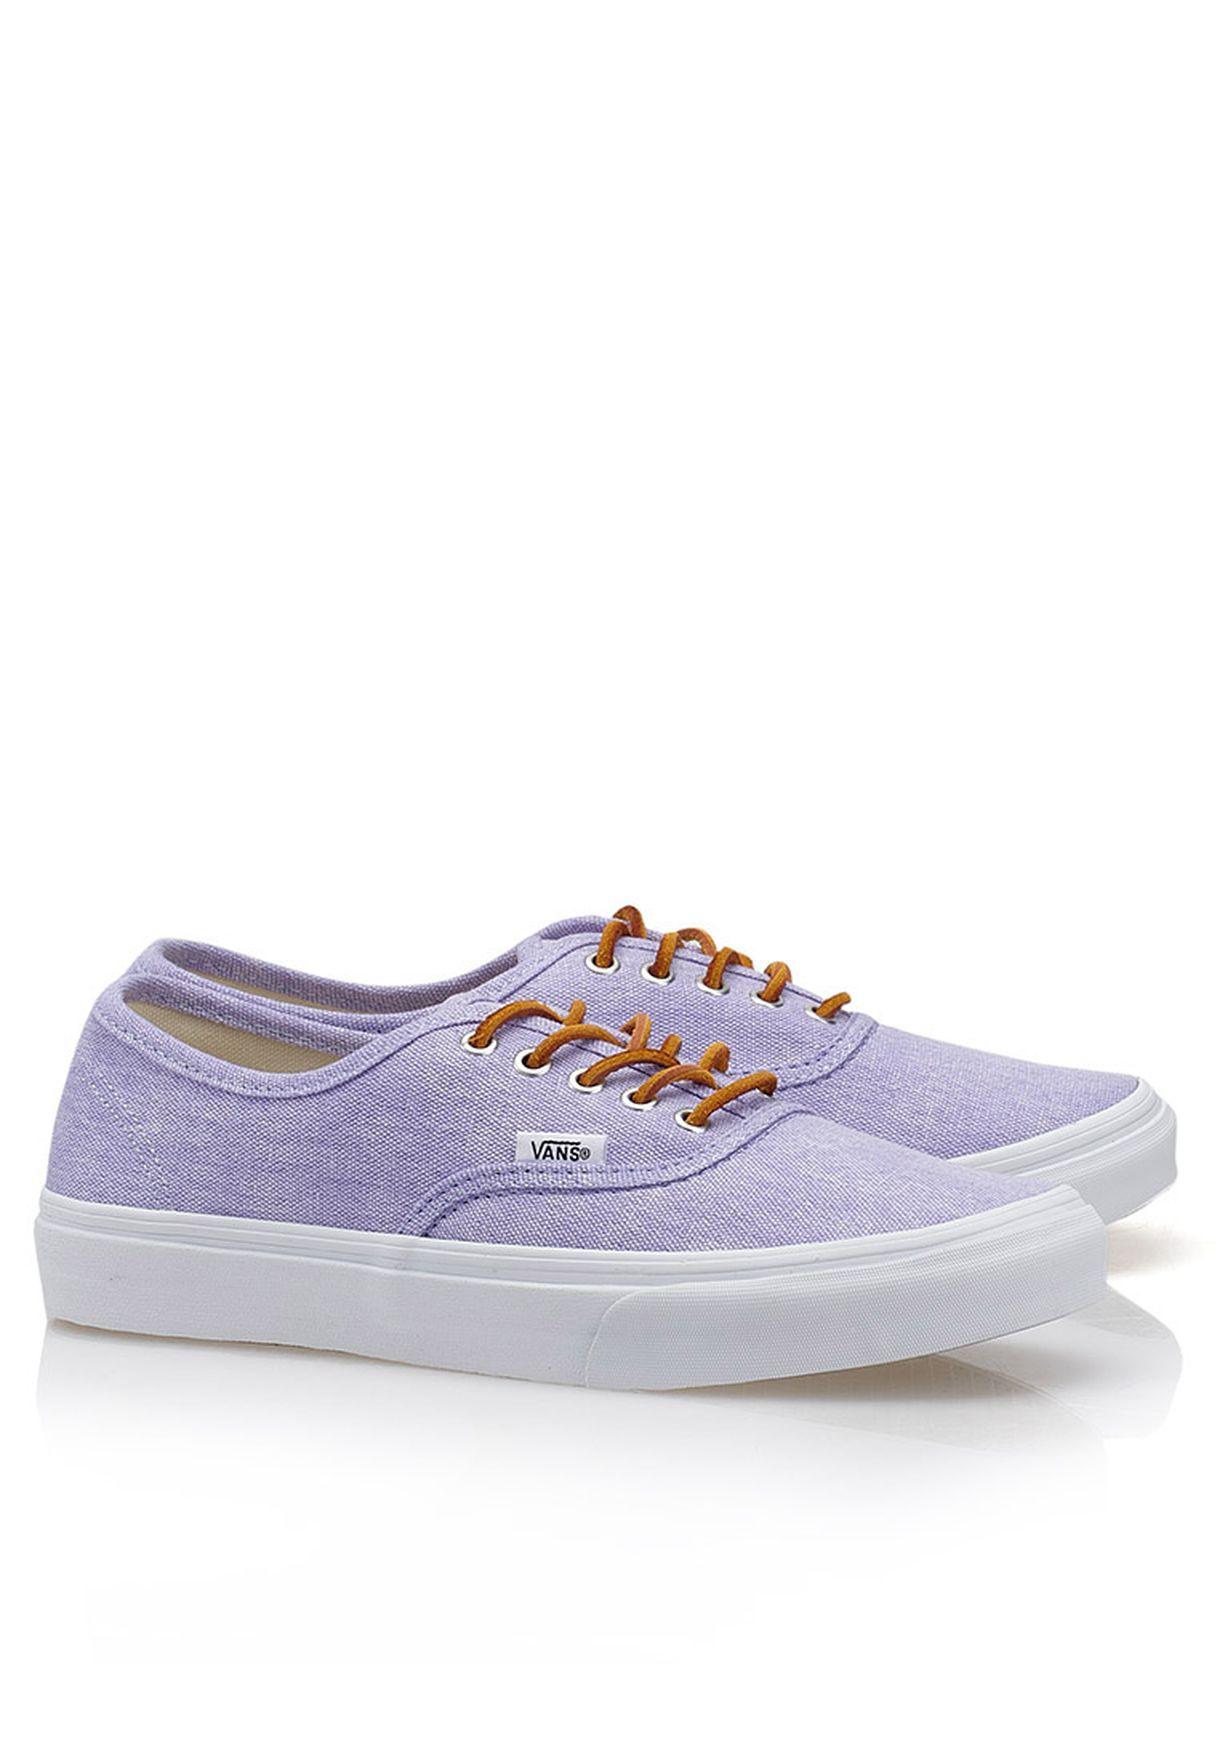 d1c2ea0af8 Shop Vans purple Authentic Slim Washed Sneakers for Women in UAE ...